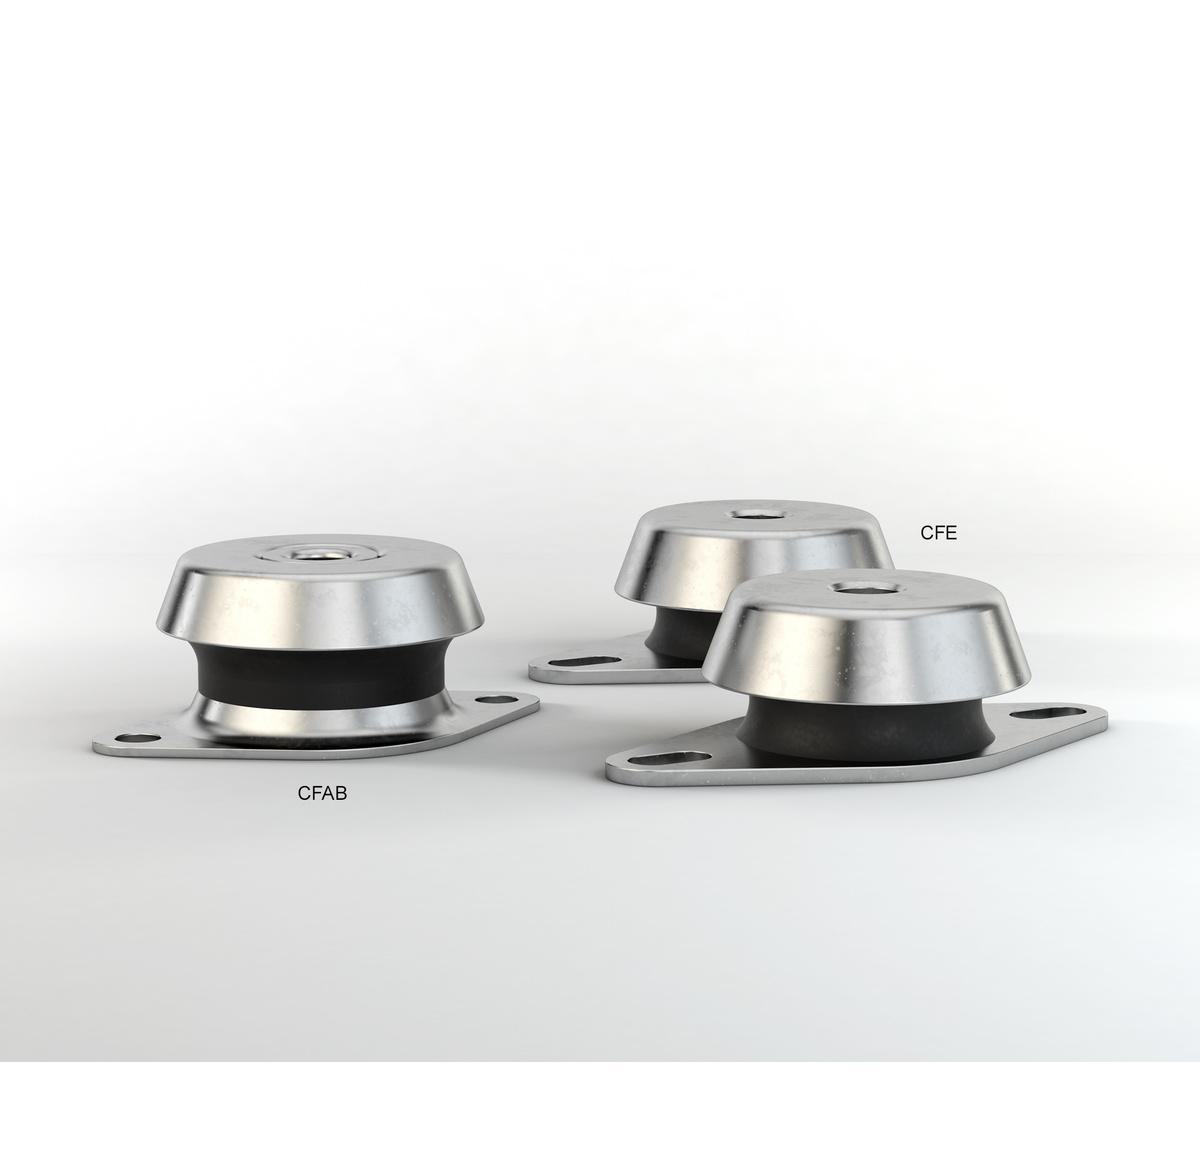 ACE Stoßdämpfer GmbH - Bild - Light Bell Mounts